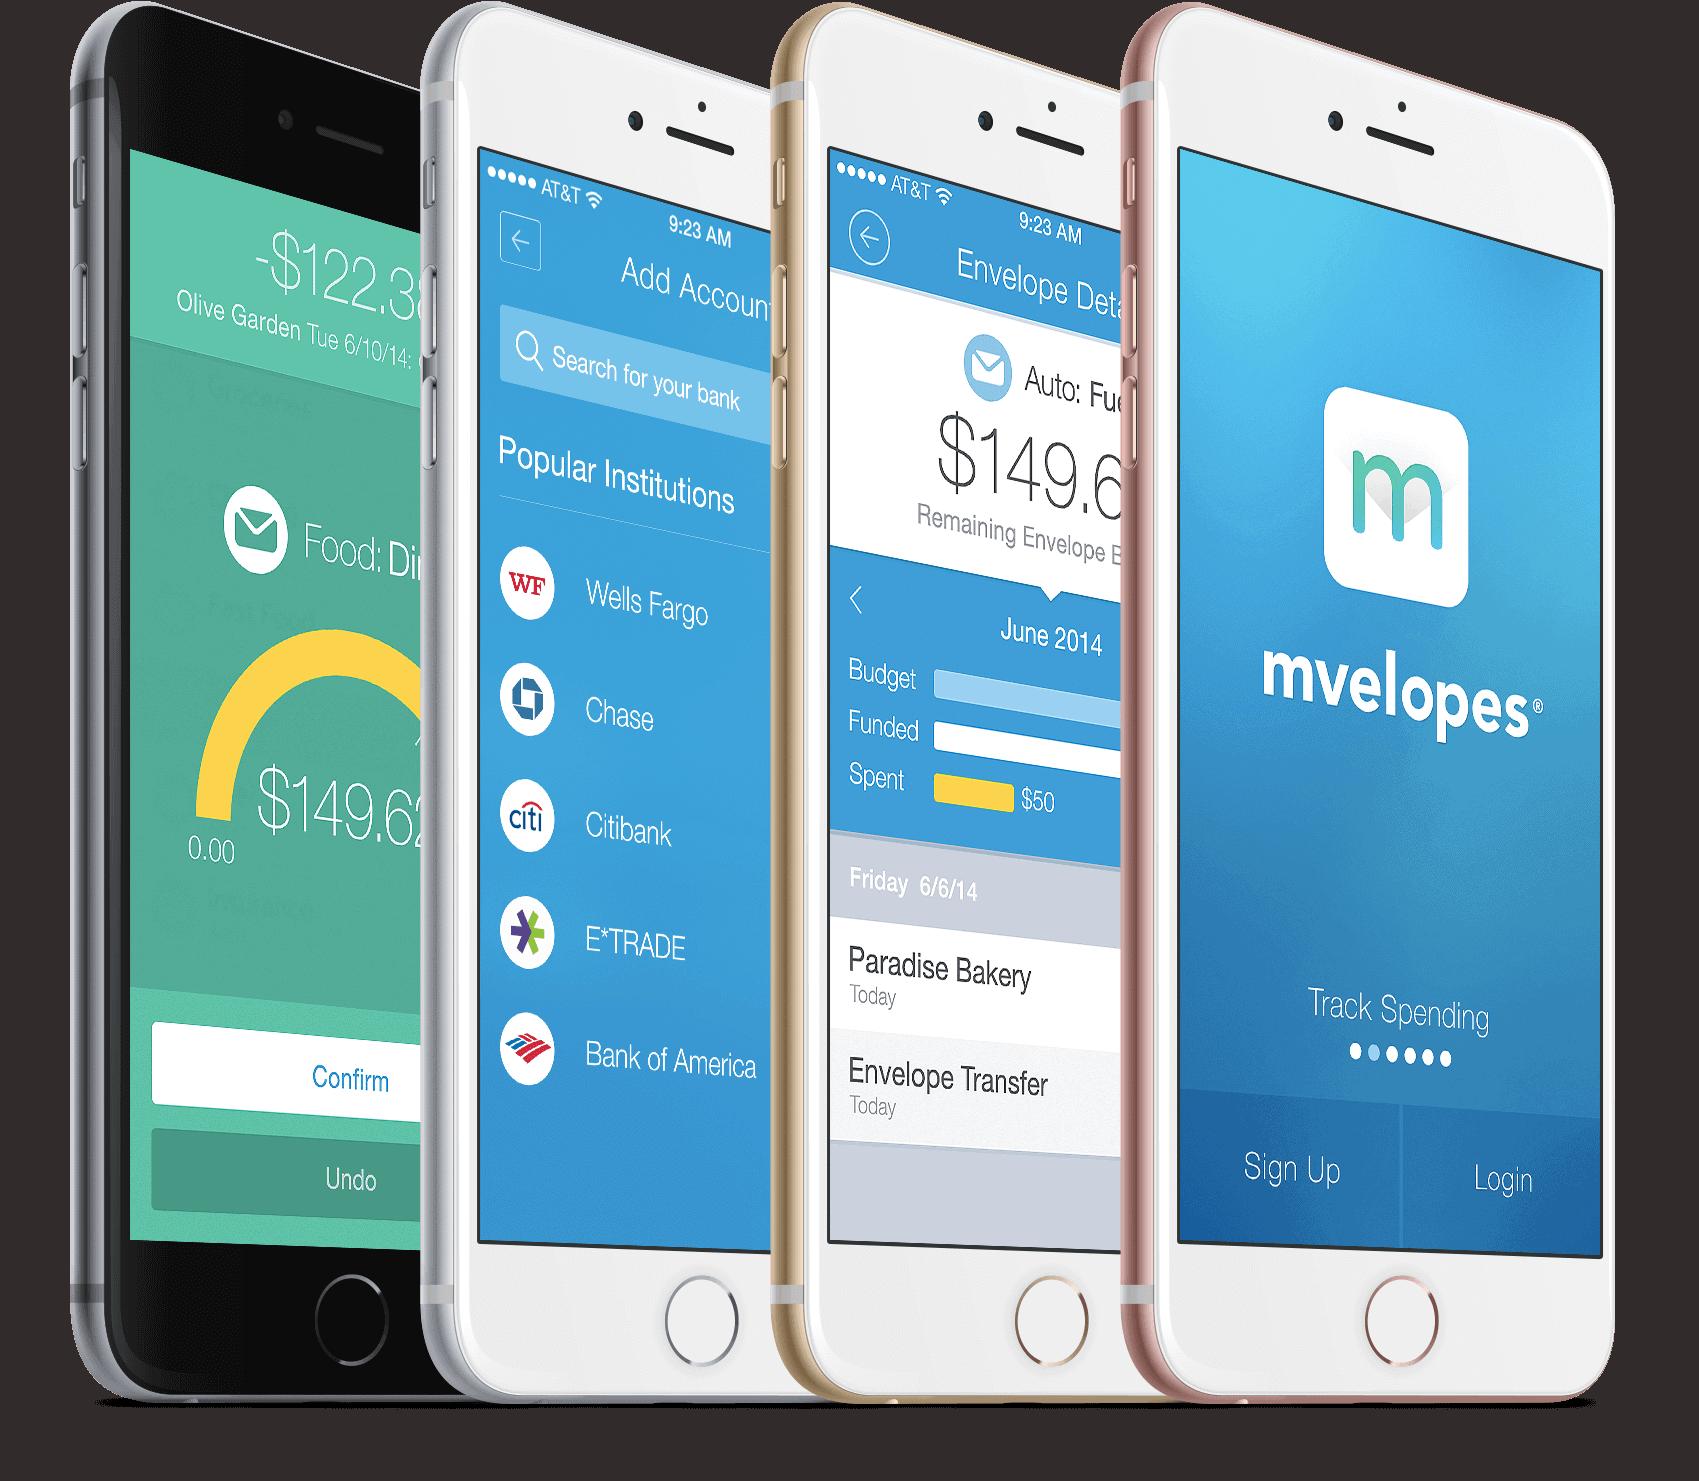 Mvelopes review virtual envelope budget system app